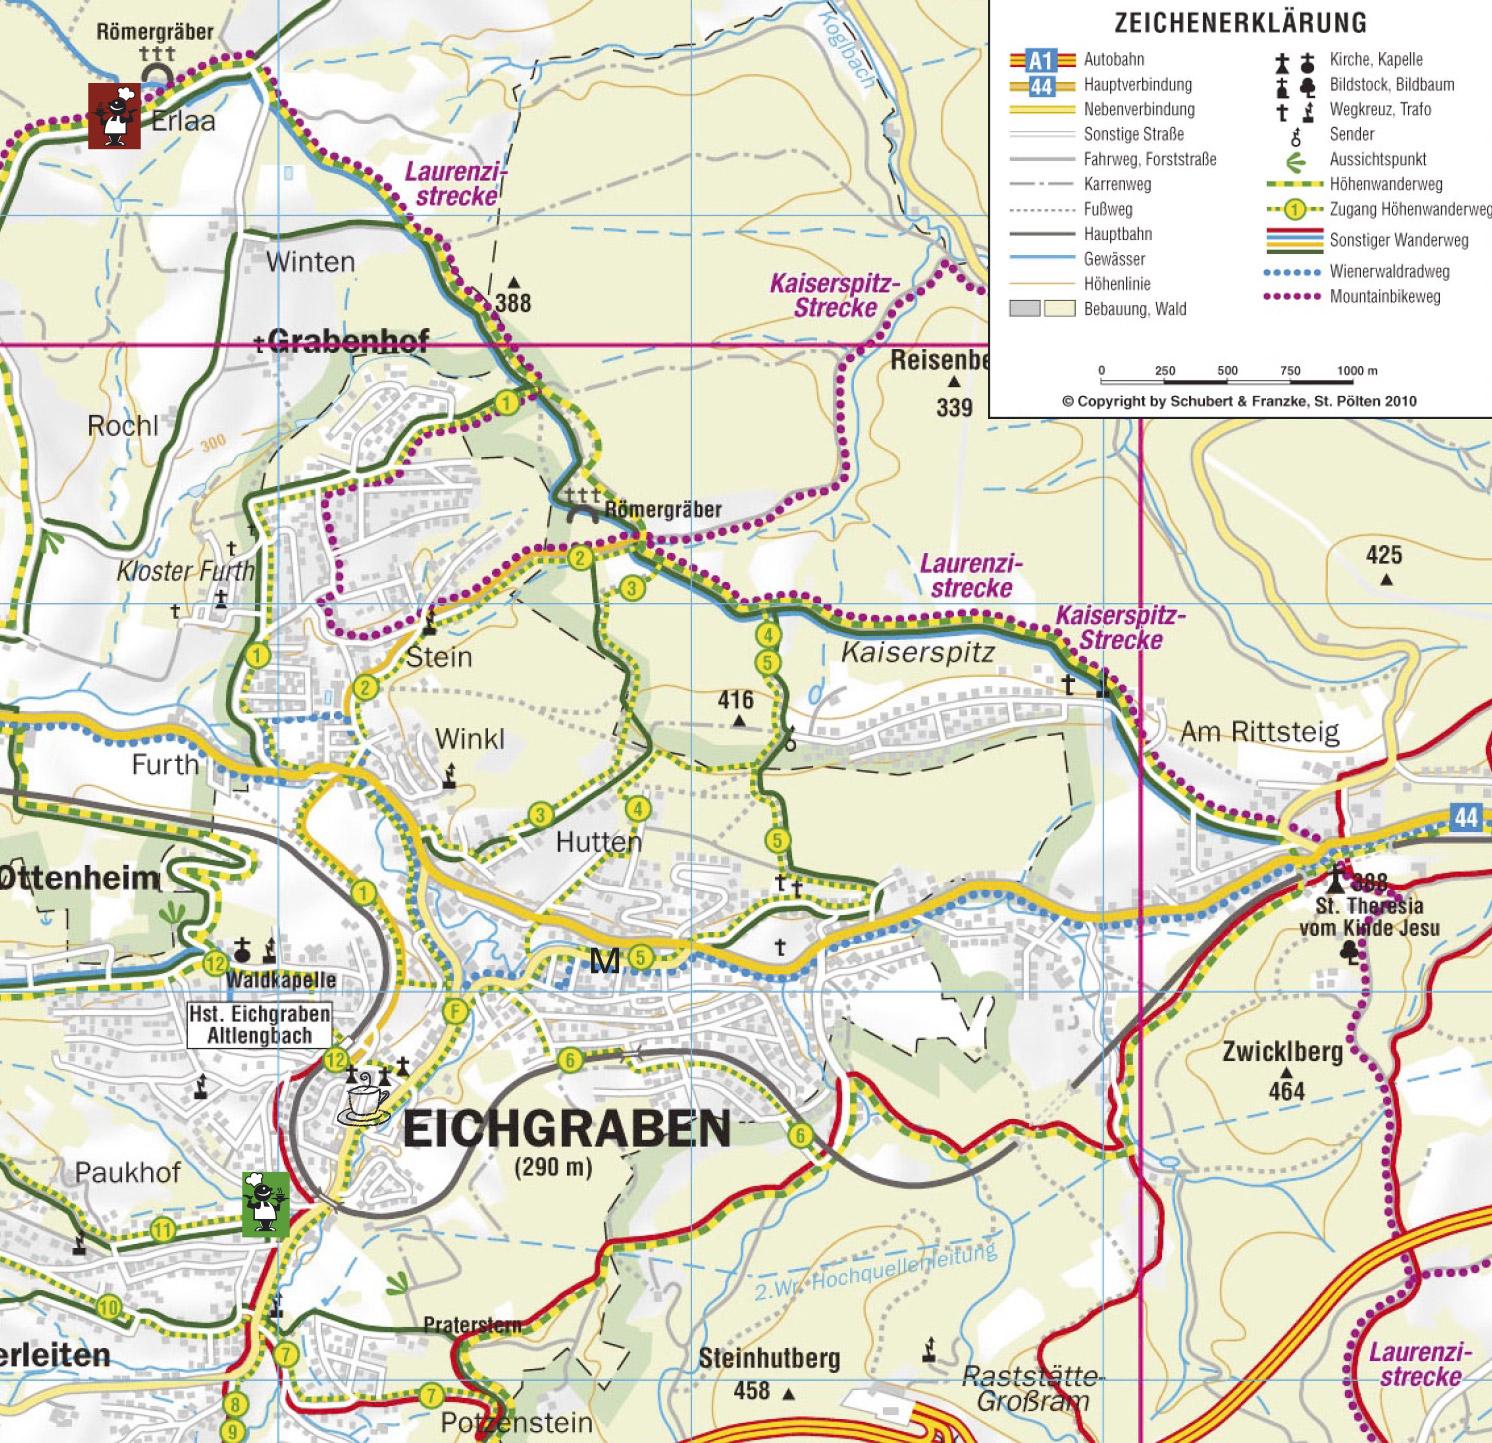 Eichgrabner Höhenwanderweg Karte